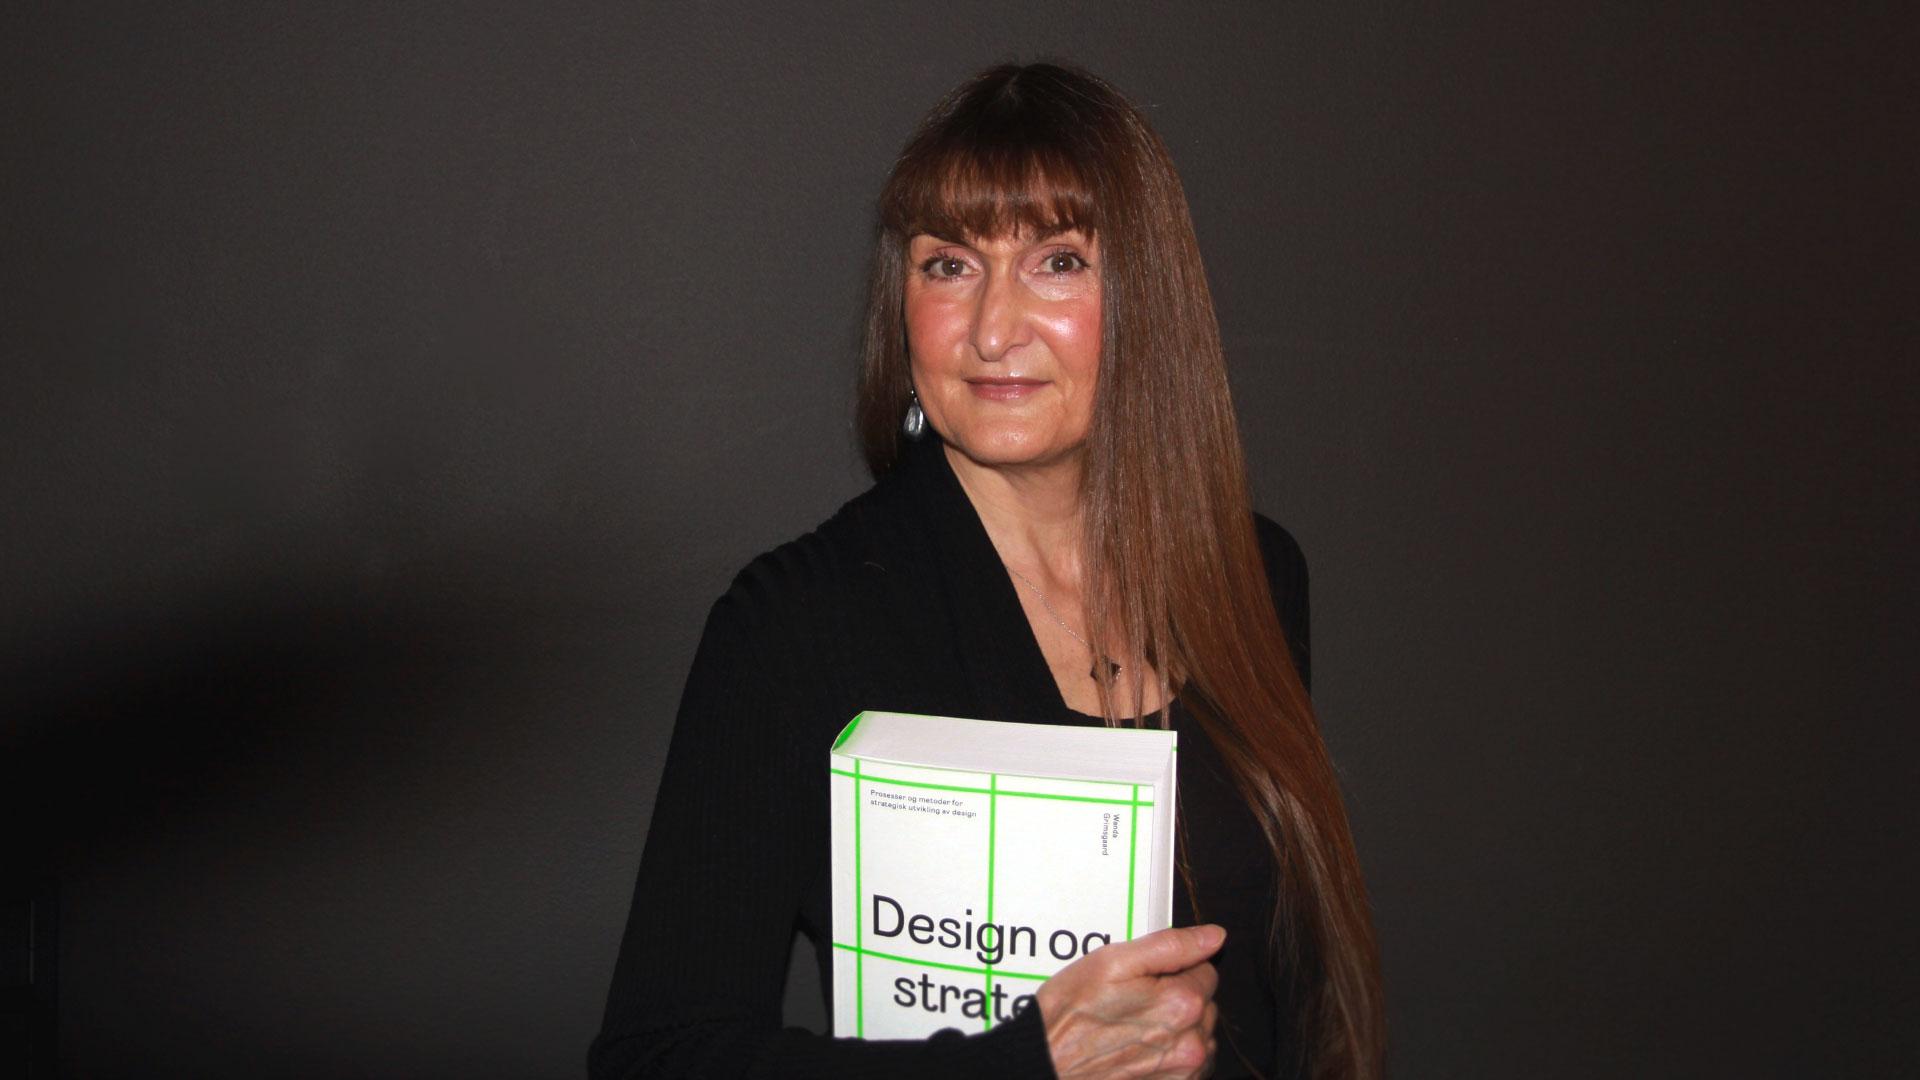 «Design og strategi» av Wanda Grimsgaard er en grunnbok i strategi og design. Foto: Sidsel Lie.